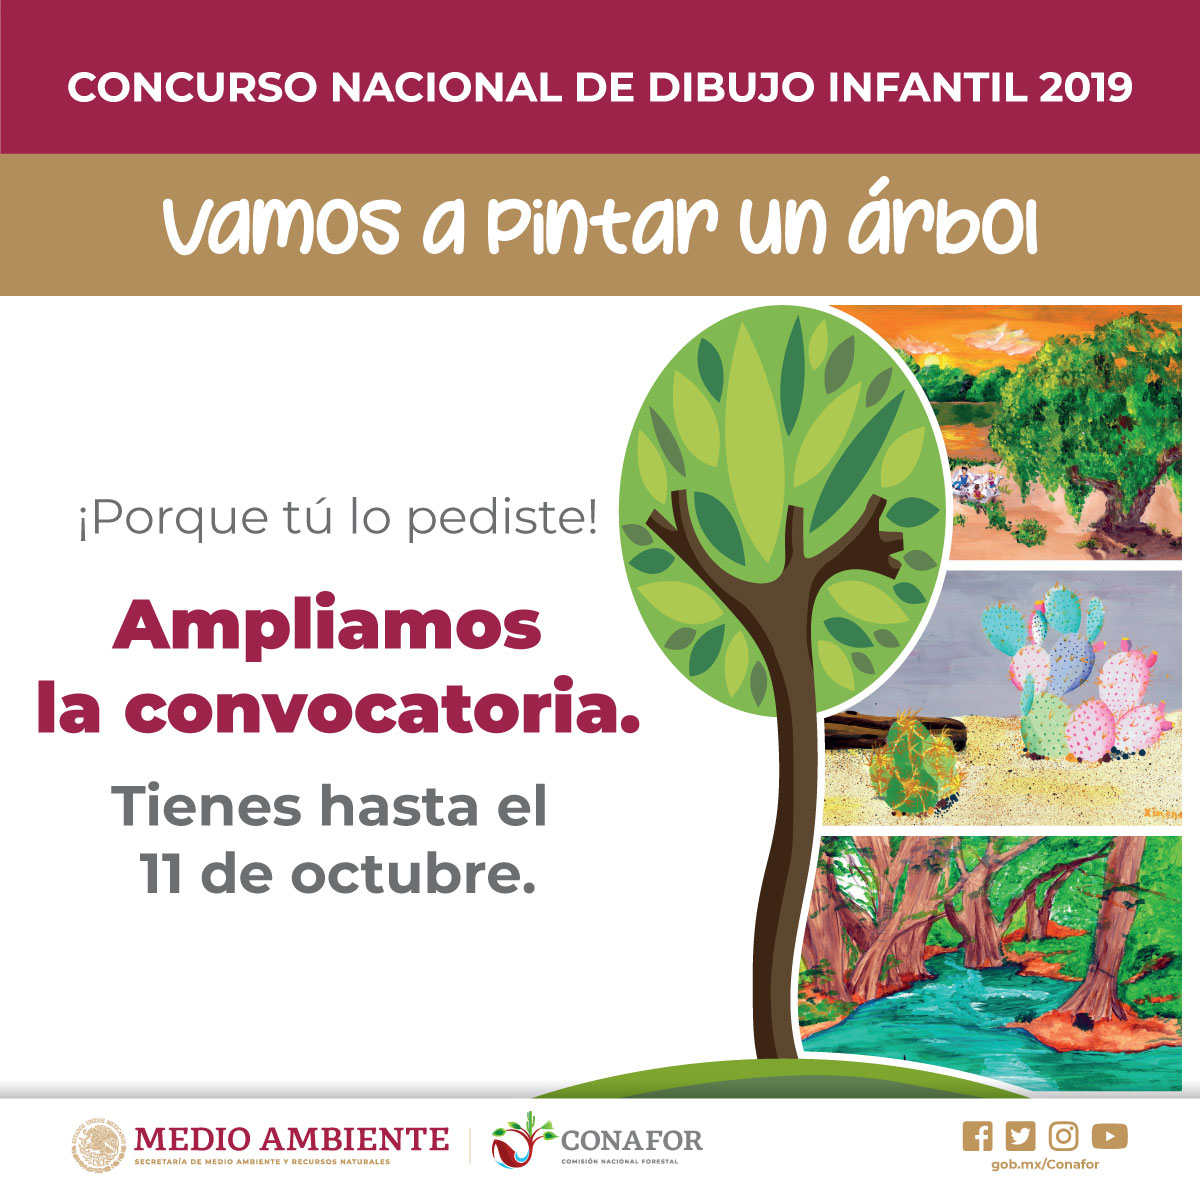 Concurso Nacional de Dibujo Infantil 2019